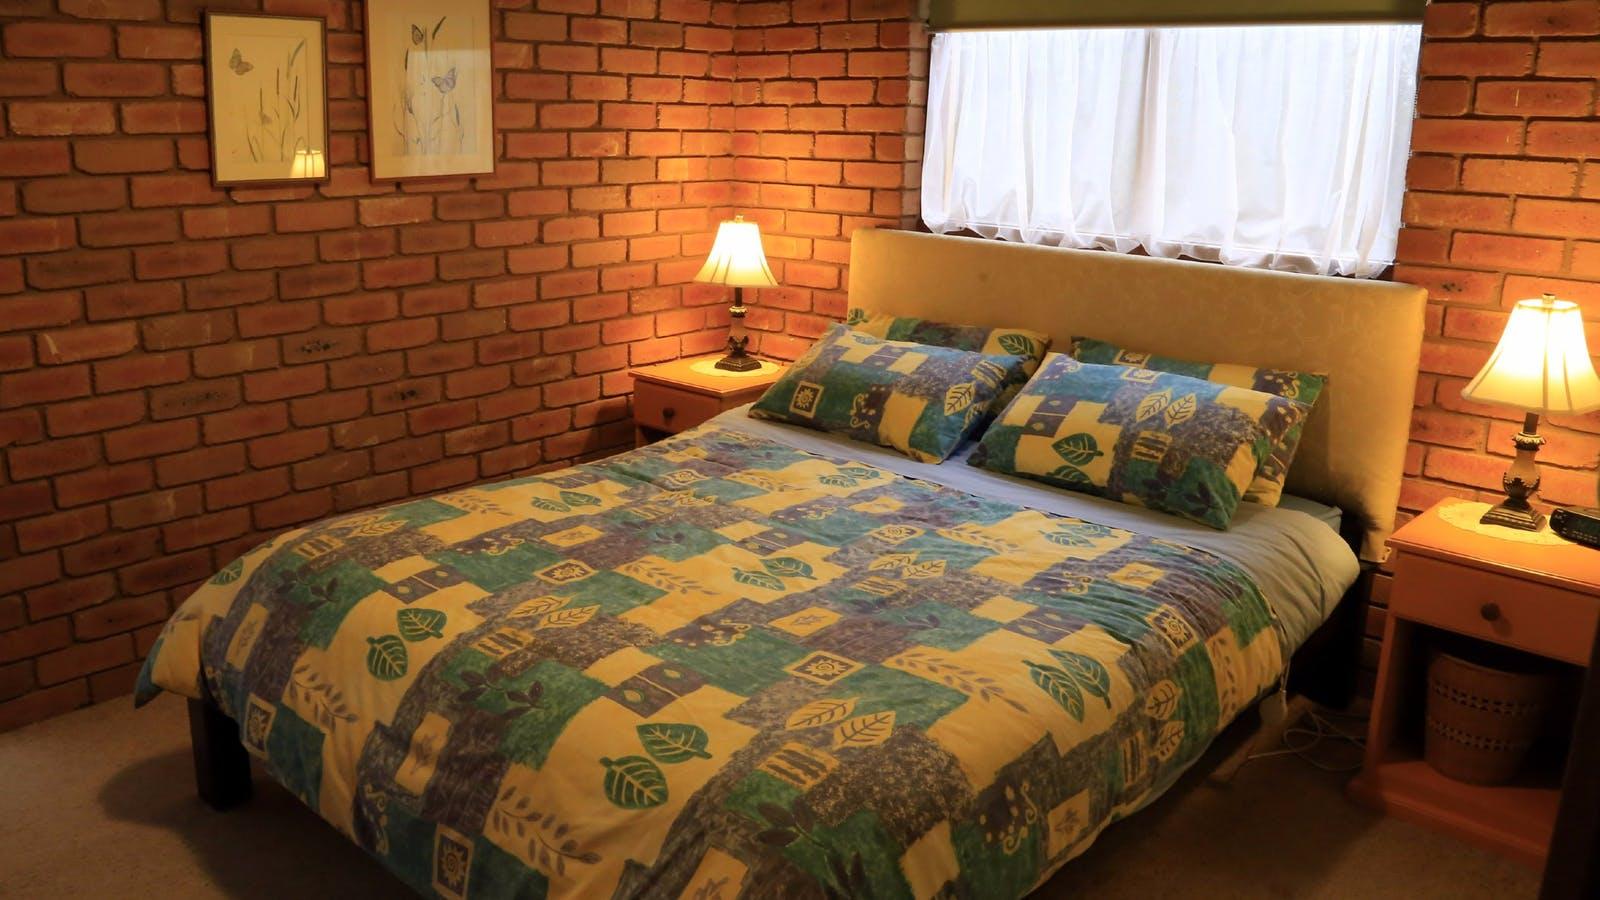 Spacious queen bed in the master bedroom